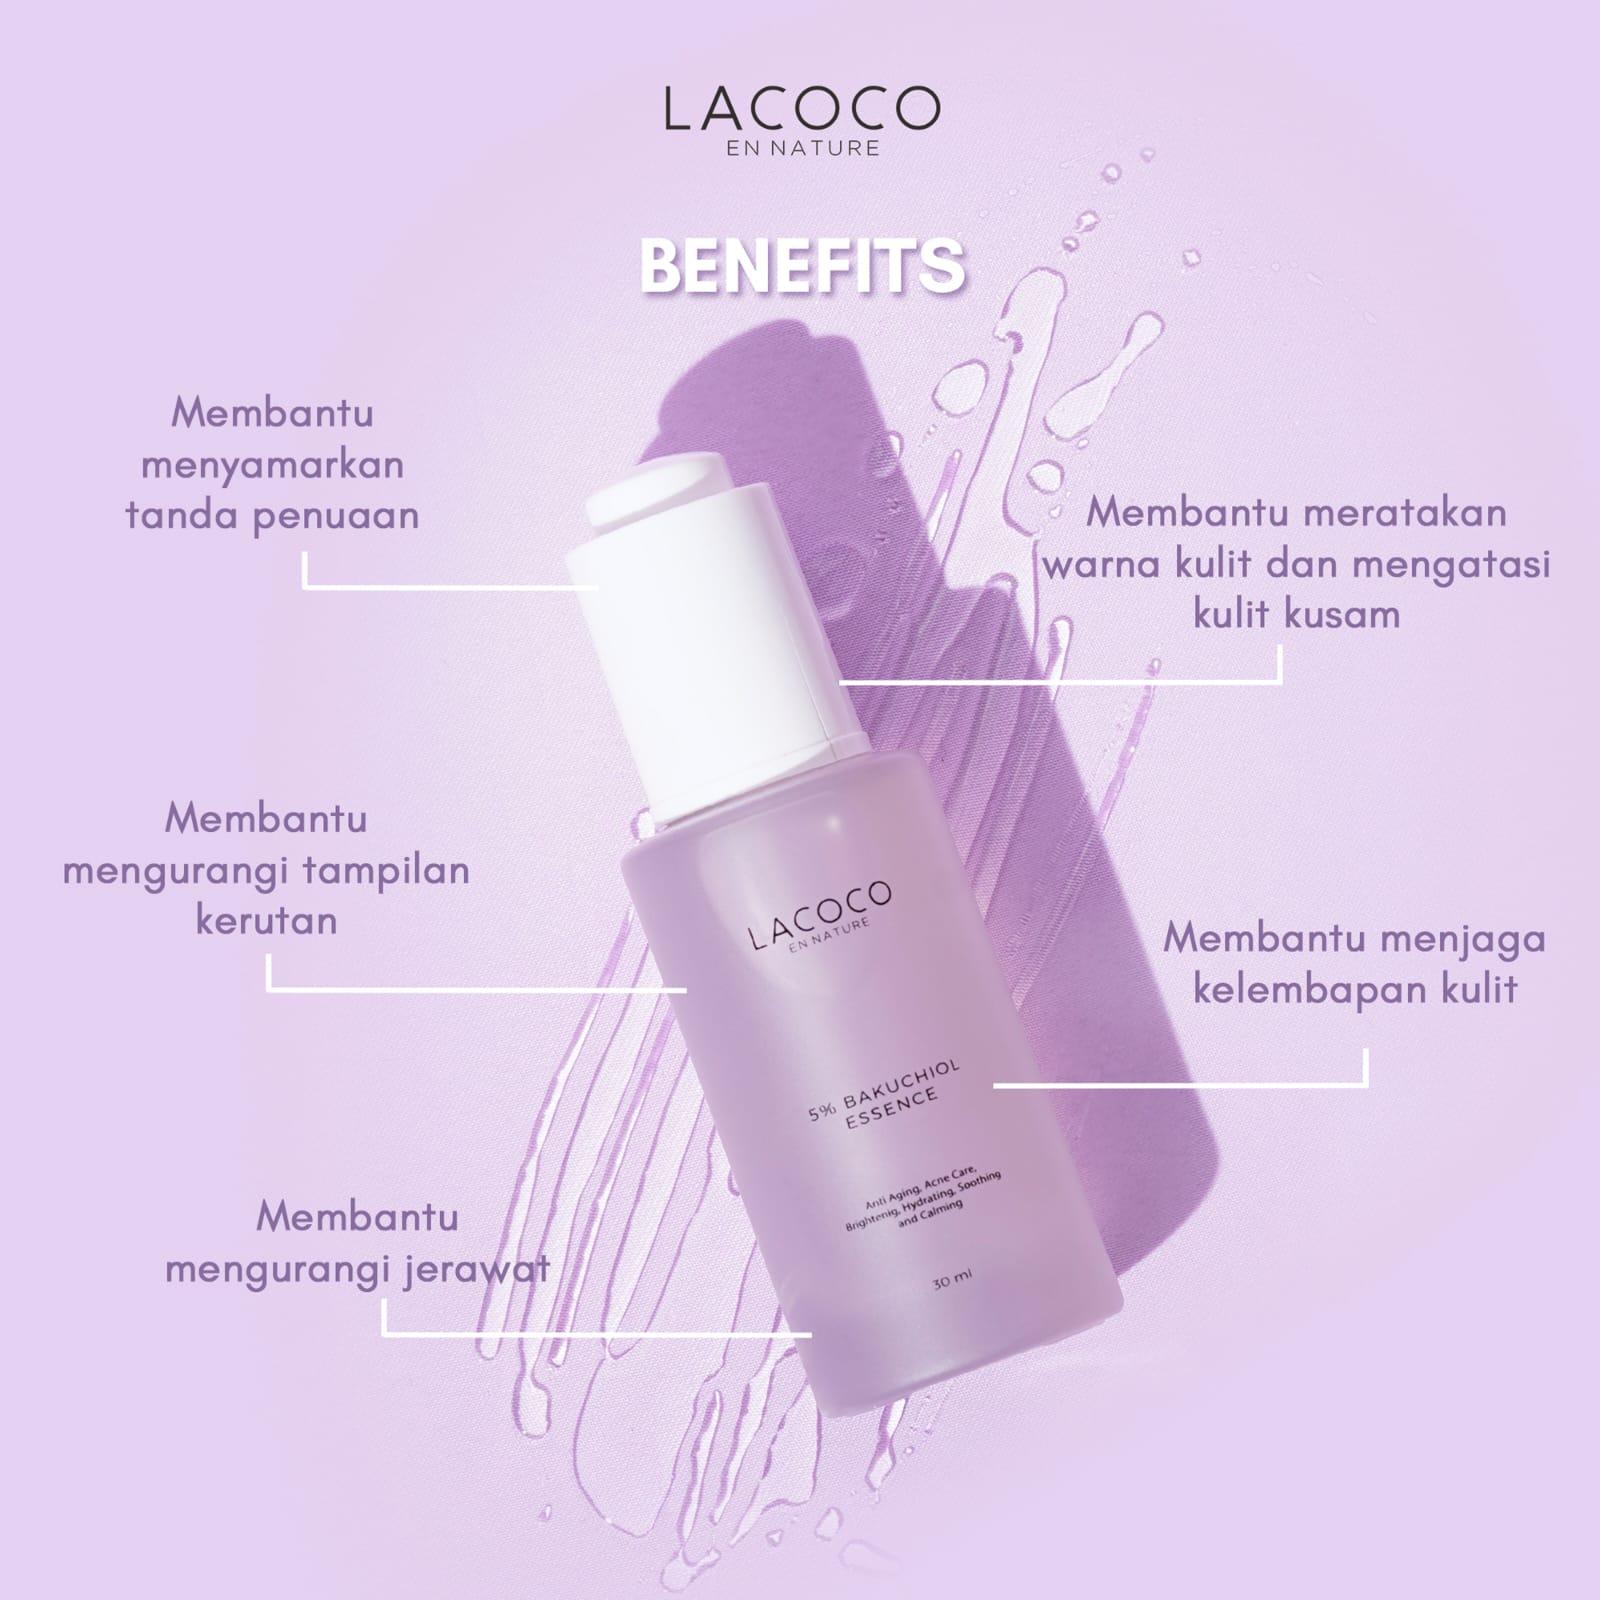 Manfaat Lacoco 5% Bakuchiol Essence